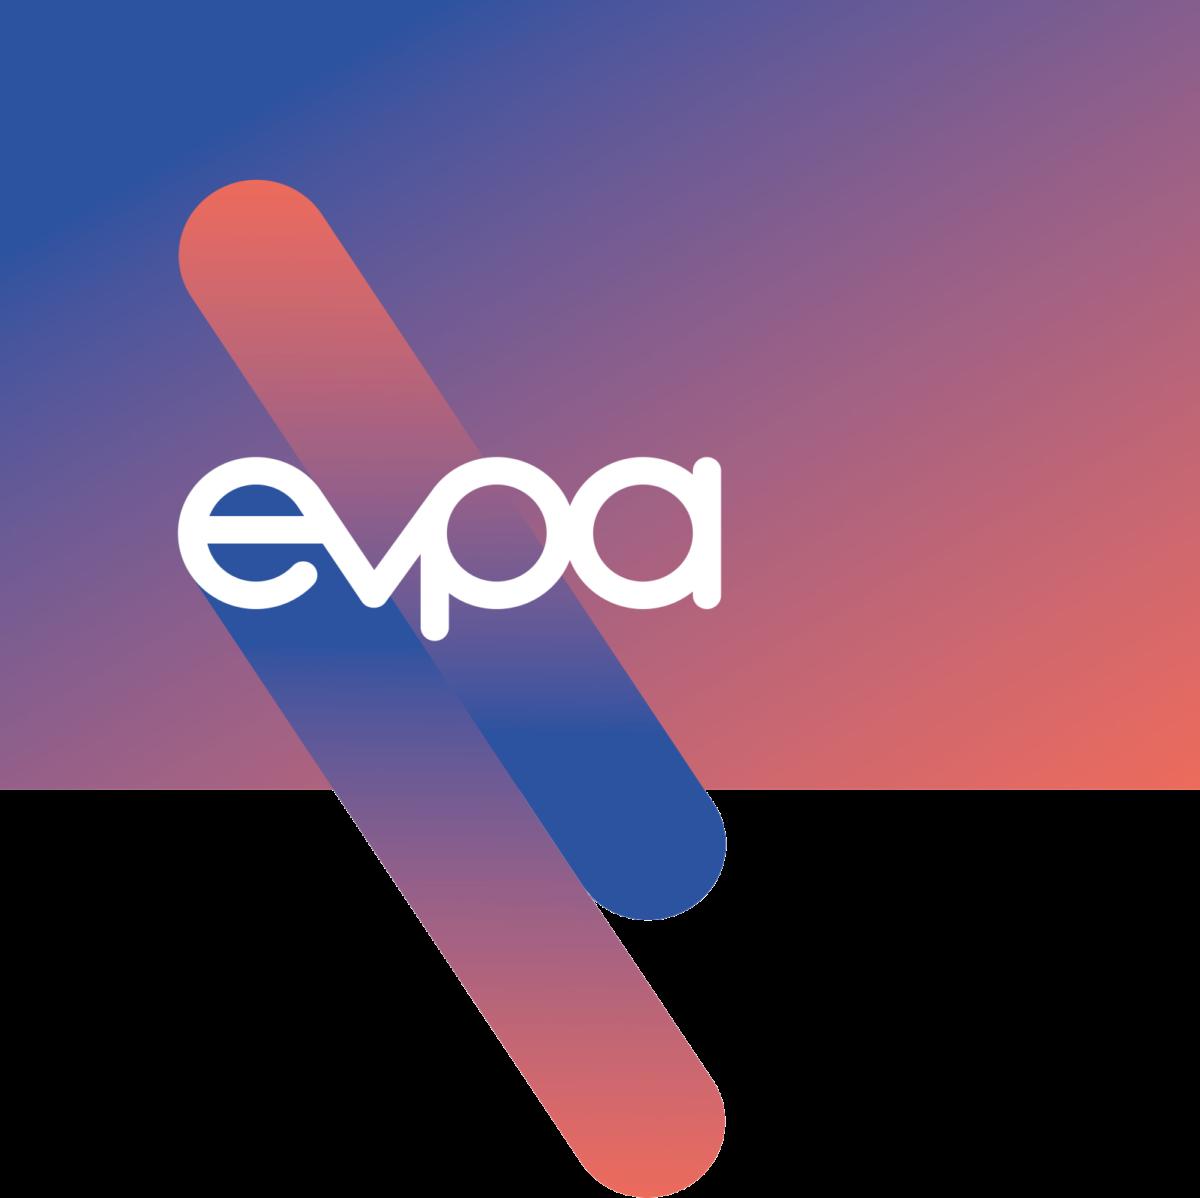 Evpa 3 Logo New